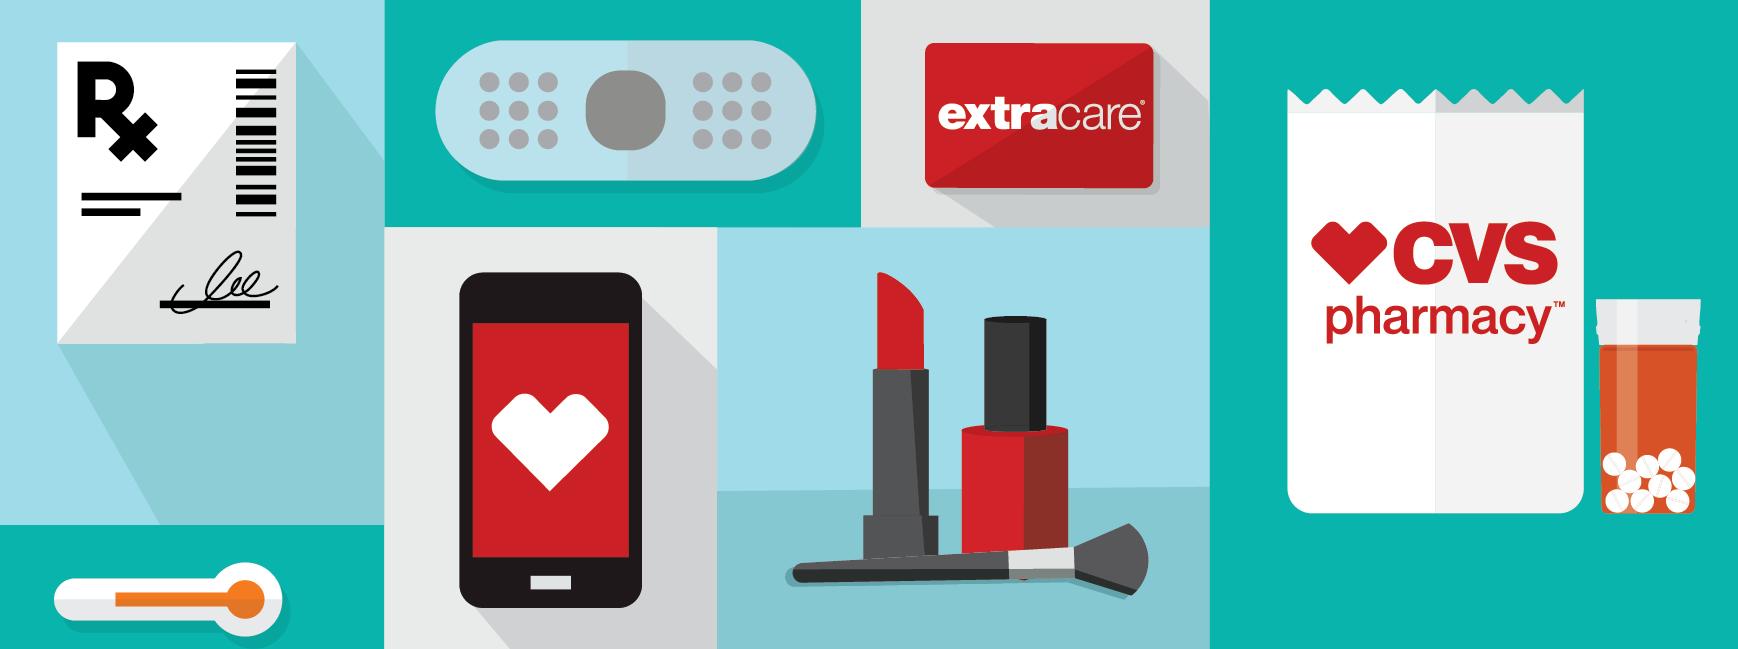 CVS Pharmacy ExtraCare Program